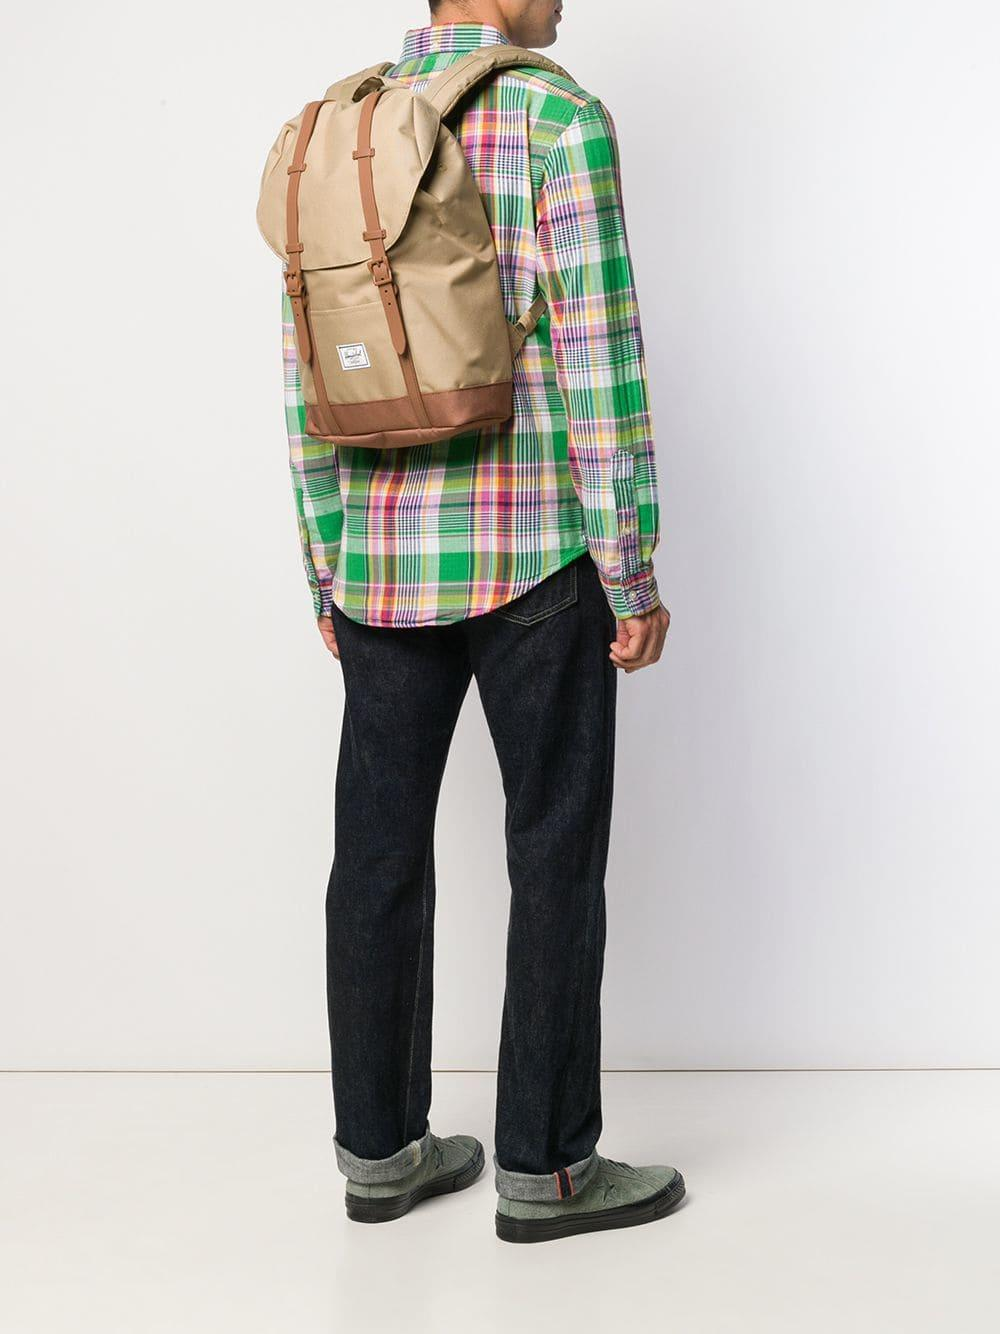 8fe48006f36 Lyst - Herschel Supply Co. Canvas Retreat Backpack for Men